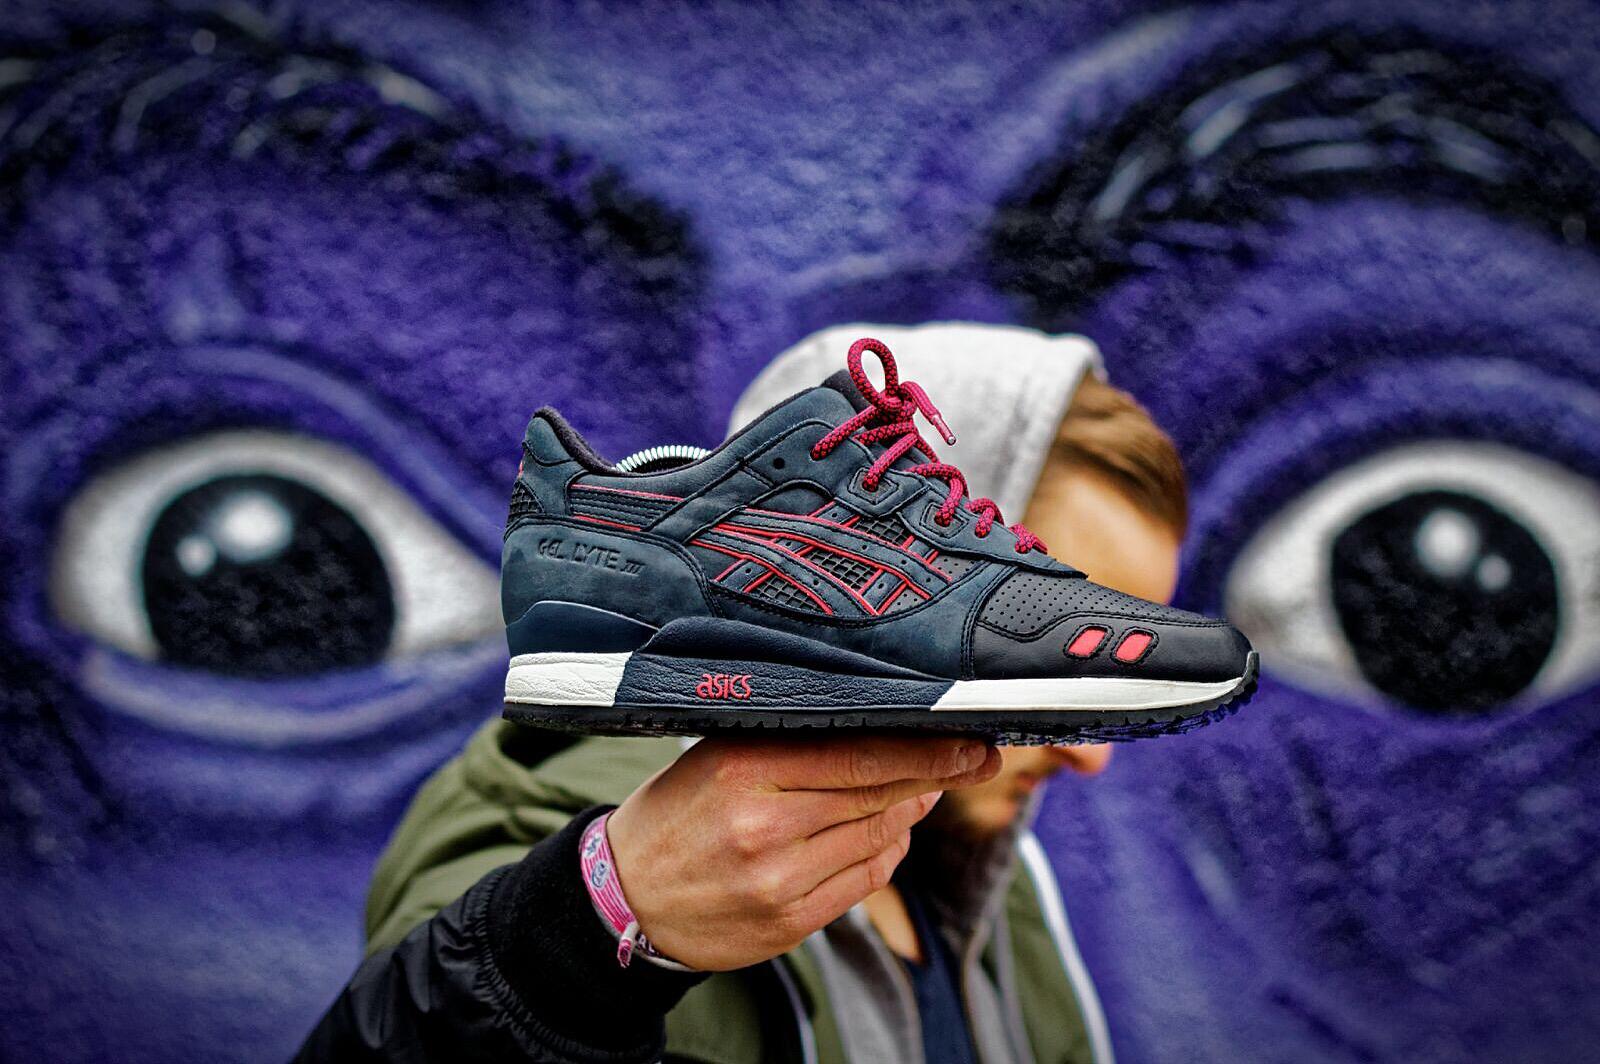 I am a sneakerhead episode 27